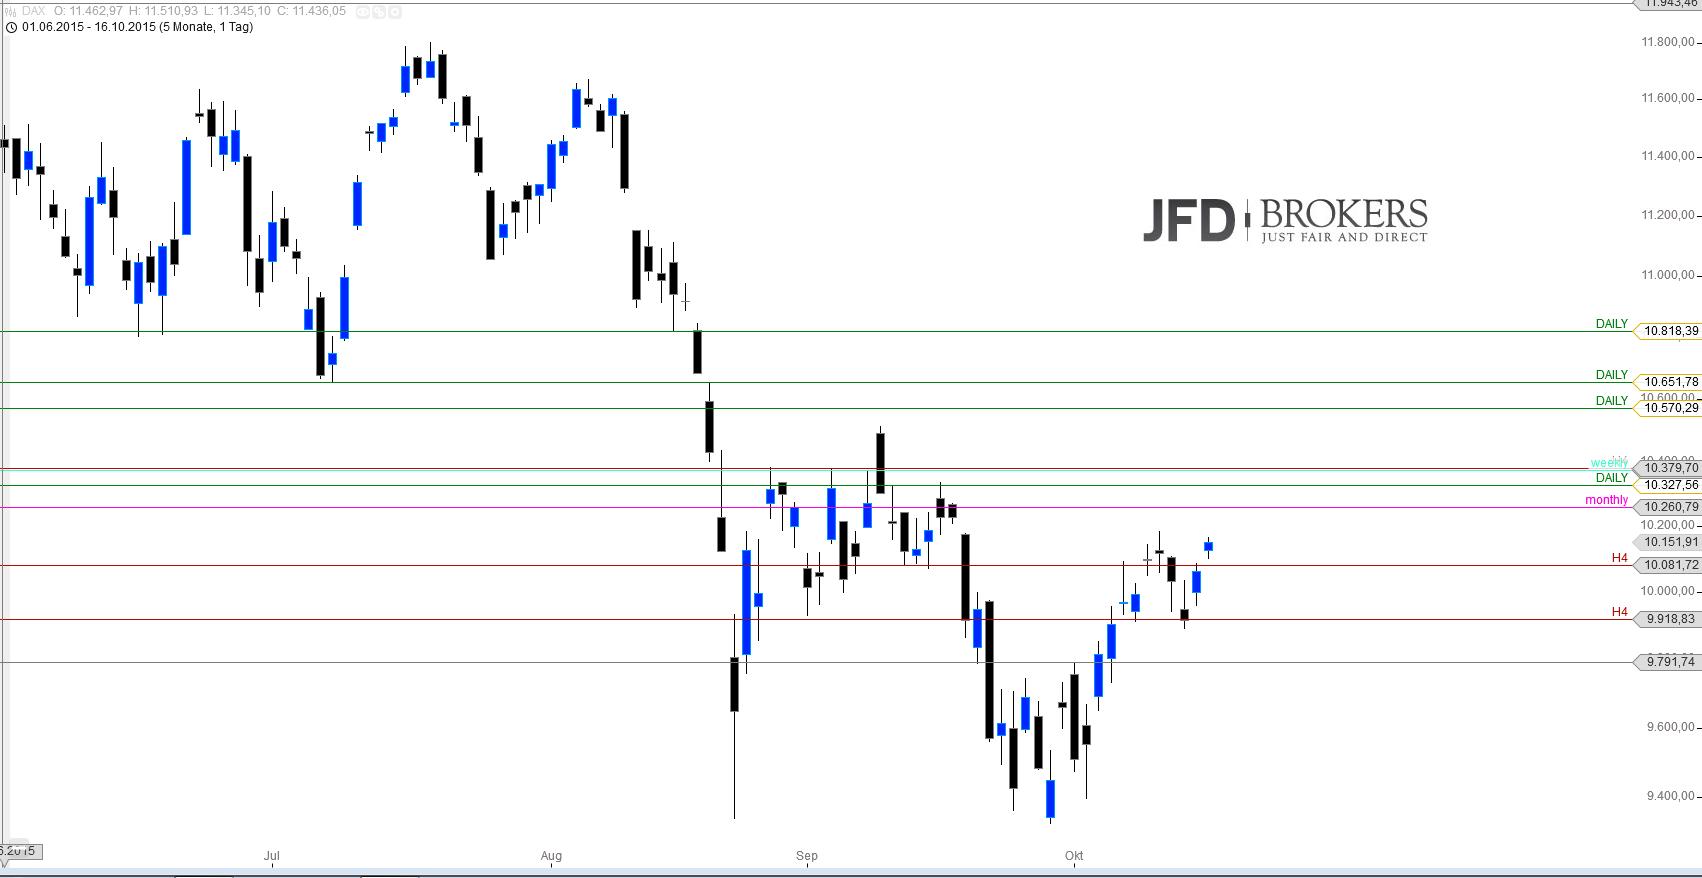 DAX-Big-Picture-Analyse-Kommentar-JFD-Brokers-GodmodeTrader.de-3